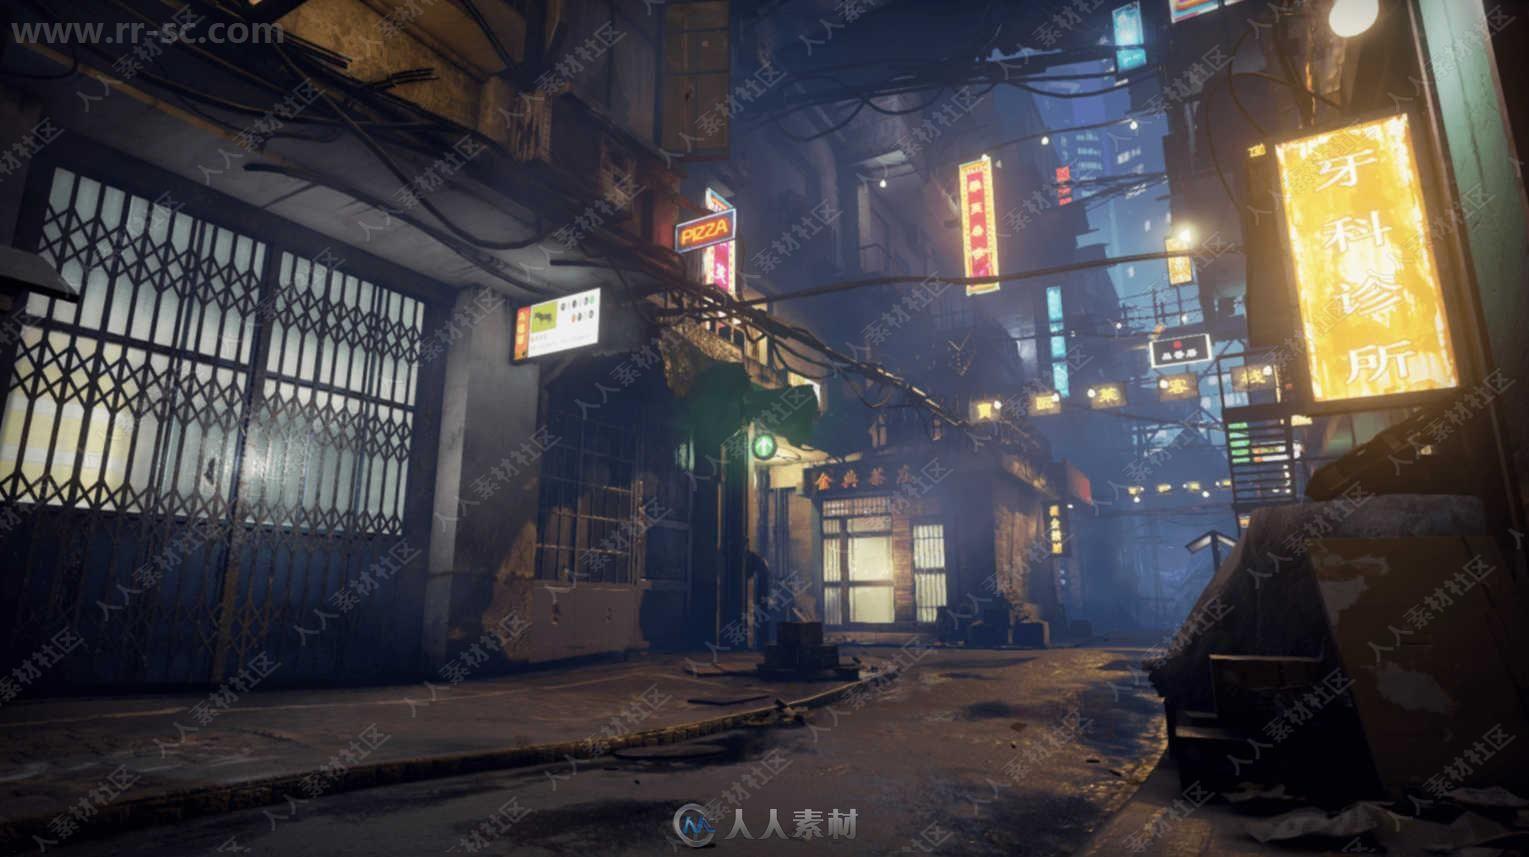 cgwellUnreal Engine虚幻游戏引擎扩展资料2018年4月合辑63 作者:Brokenangel 帖子ID:89961